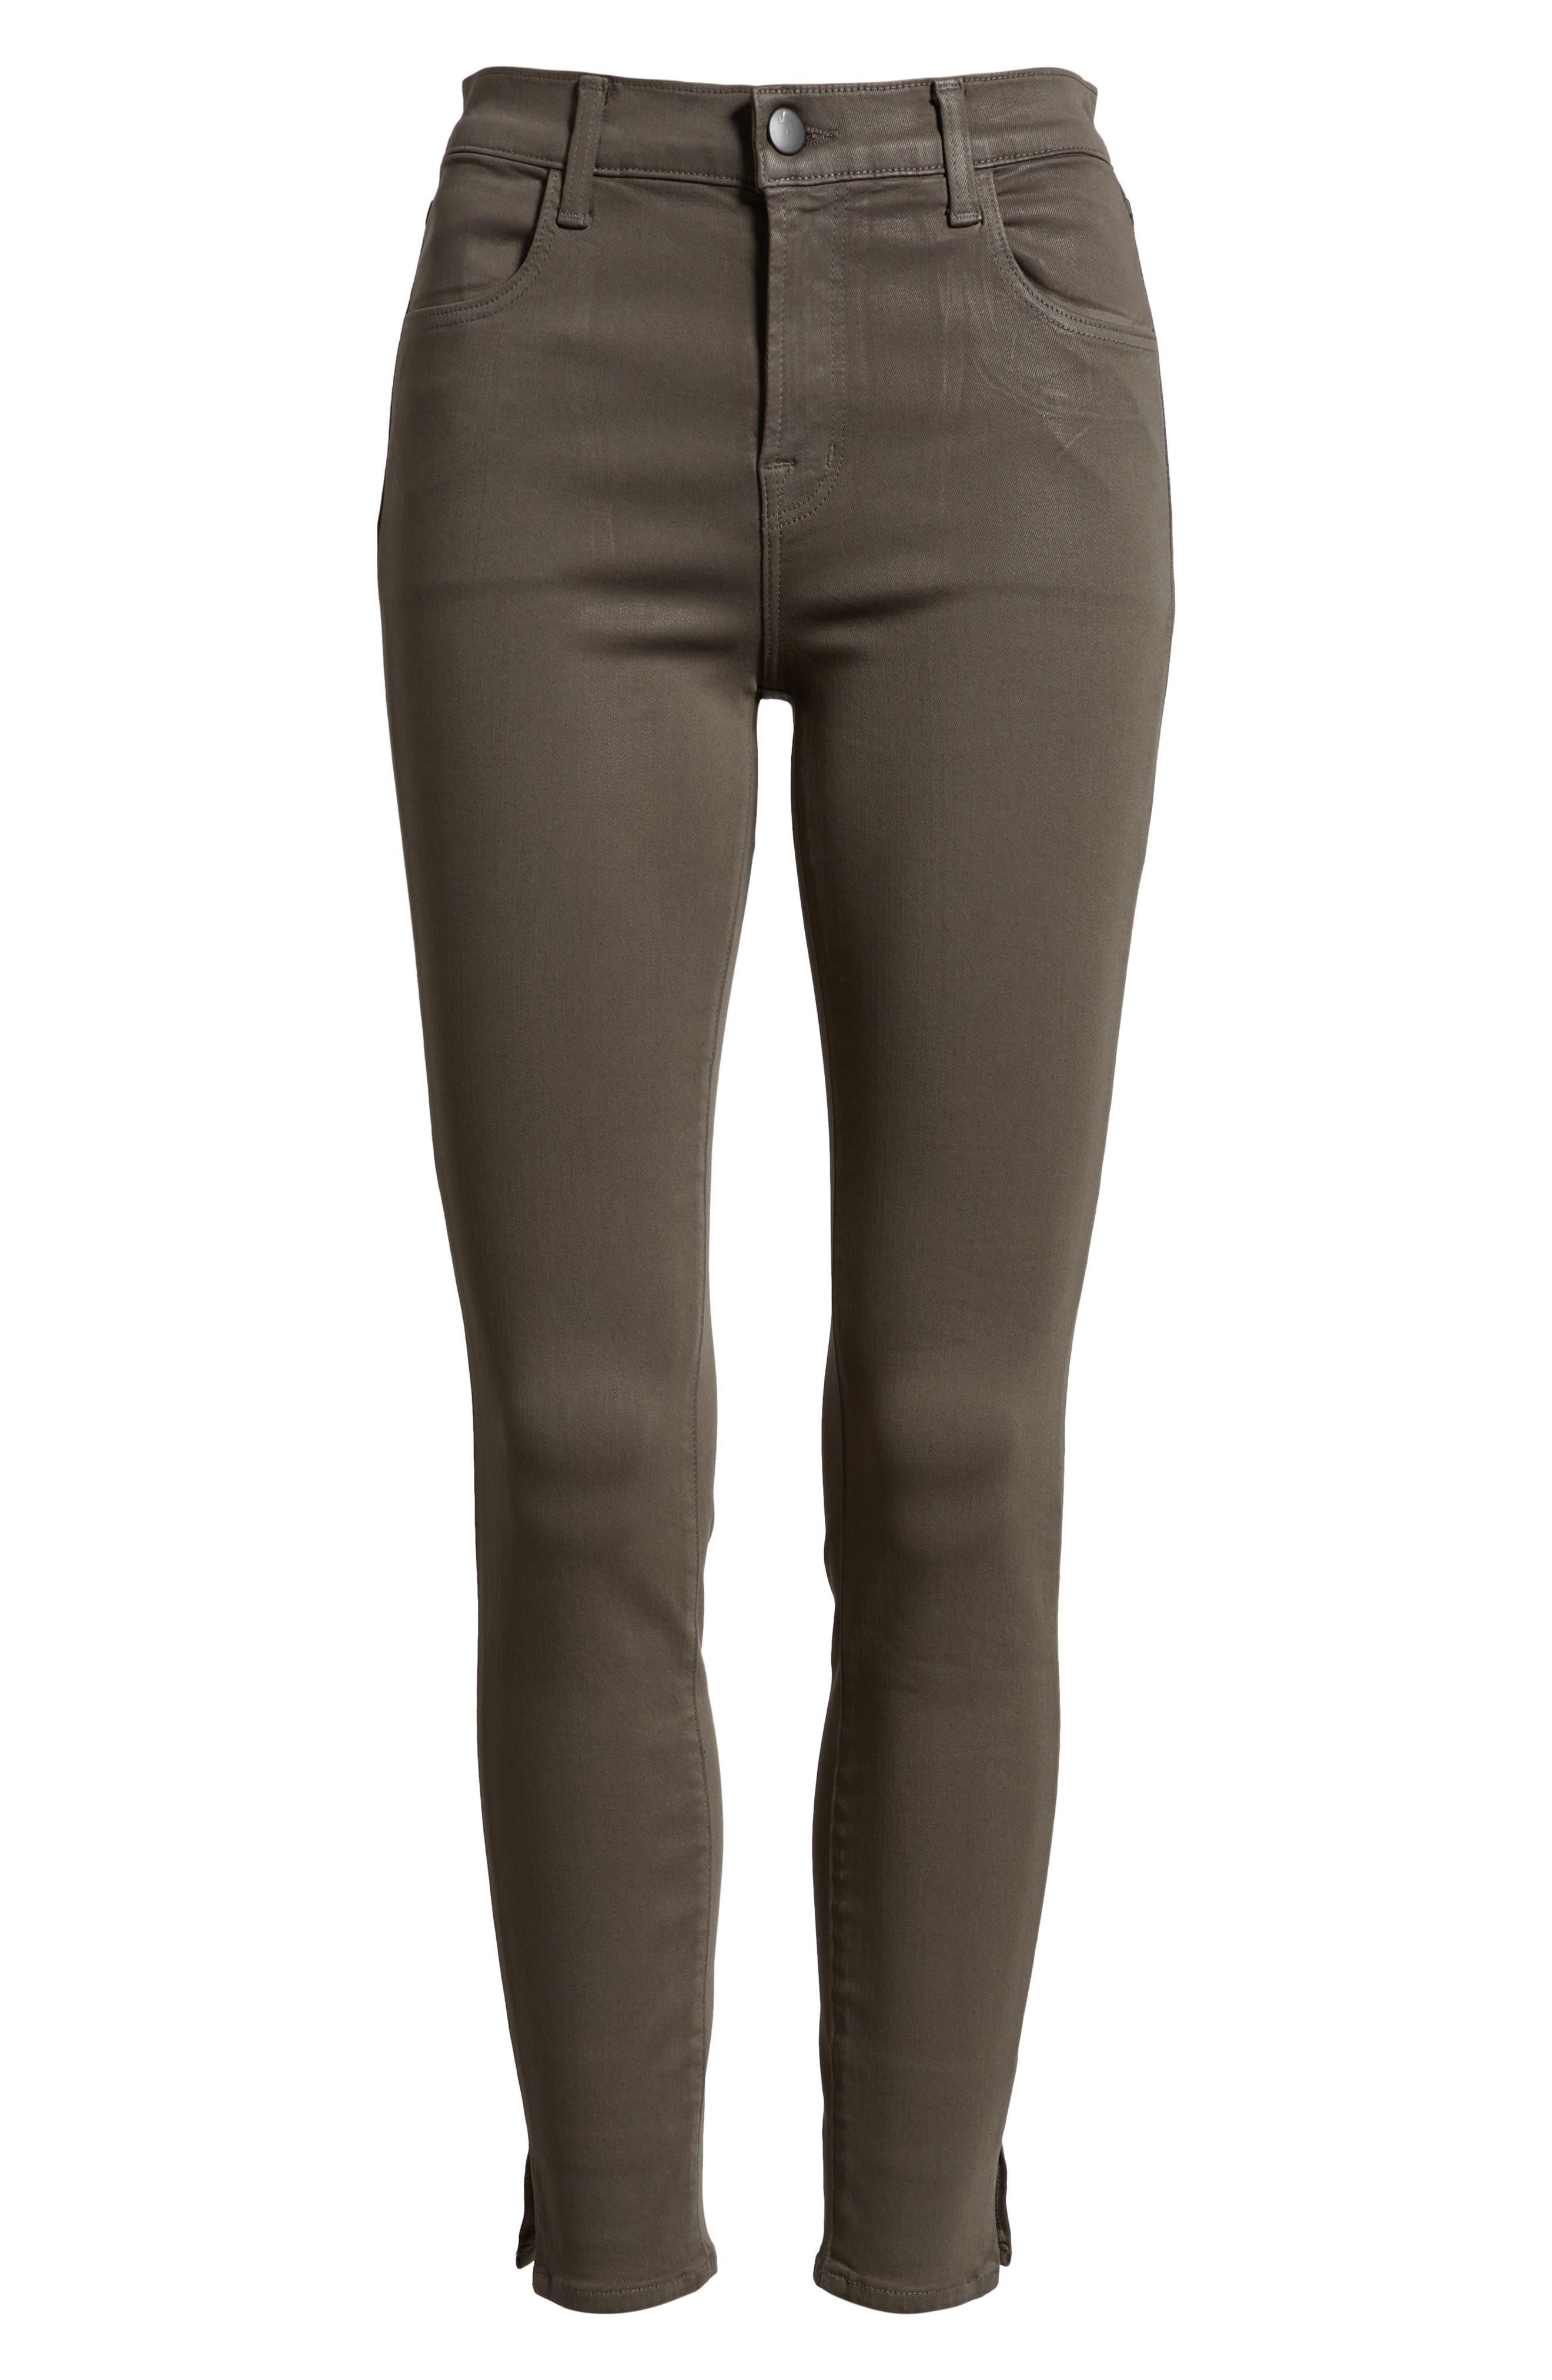 Alana High Waist Crop Skinny Jeans,                             Alternate thumbnail 7, color,                             COATED JUNIPER